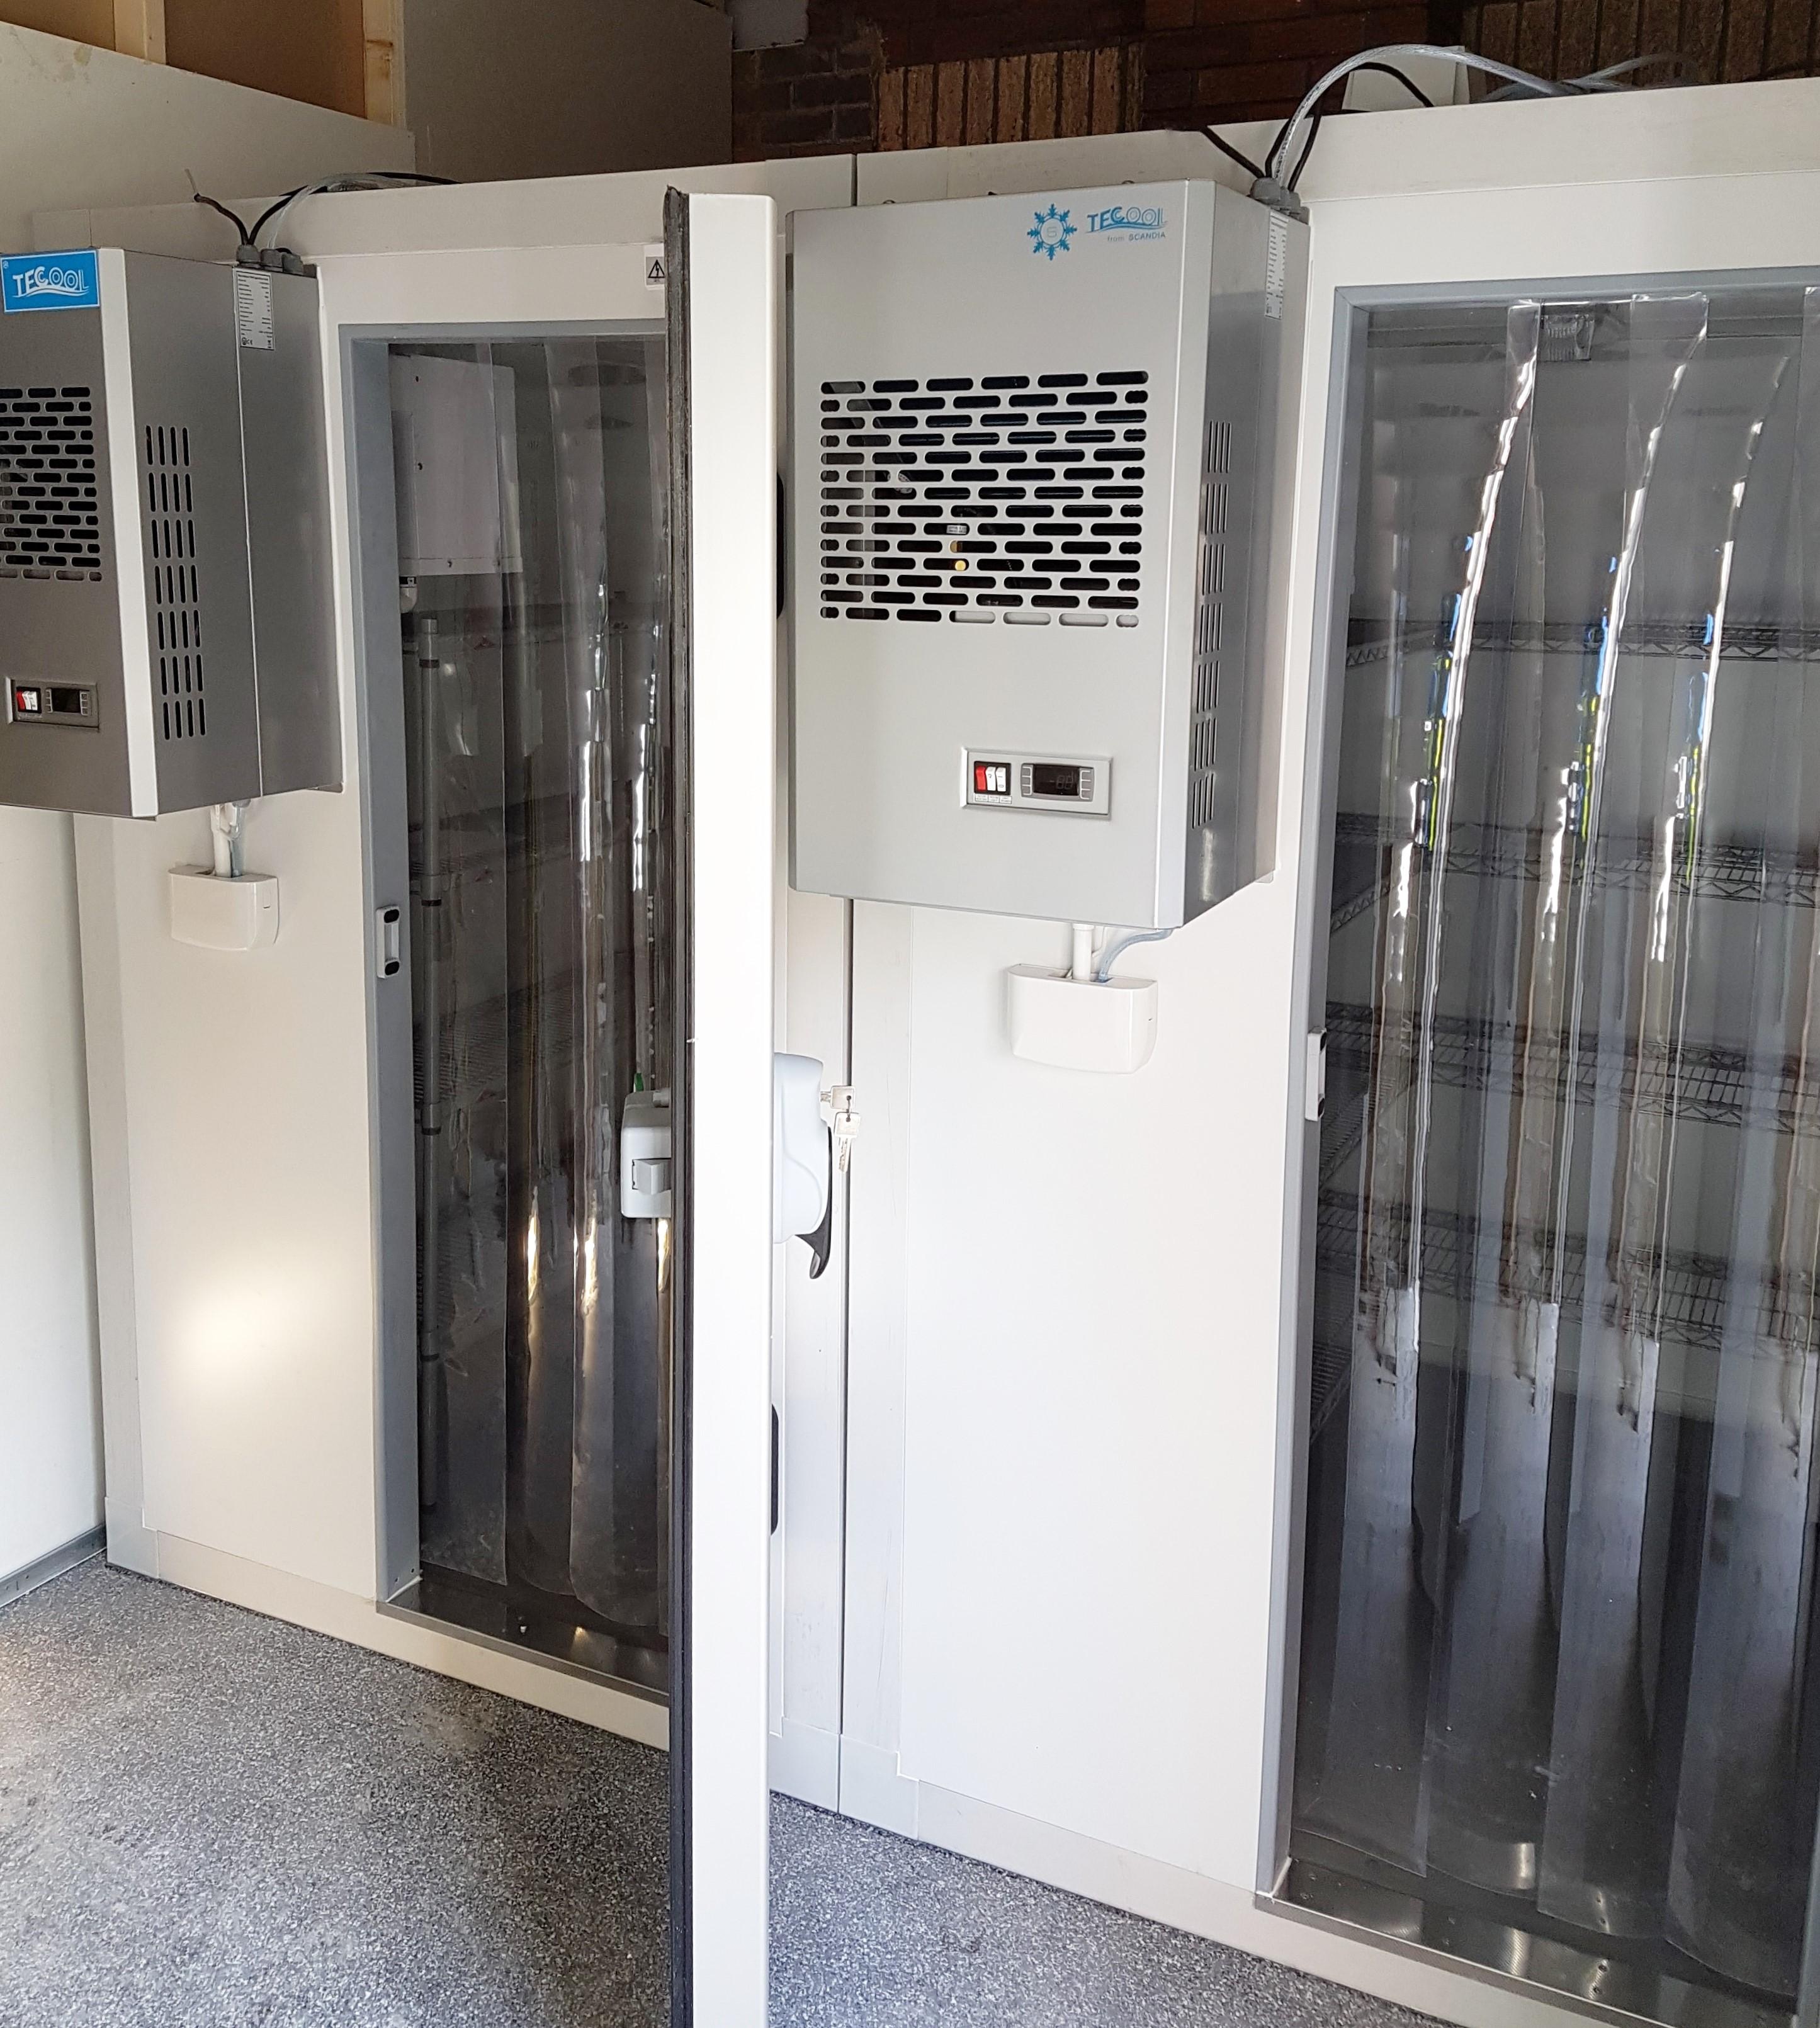 Scandia Refrigeration Ltd - Clacton-on-Sea, Essex CO15 4LU - 01255 433595 | ShowMeLocal.com